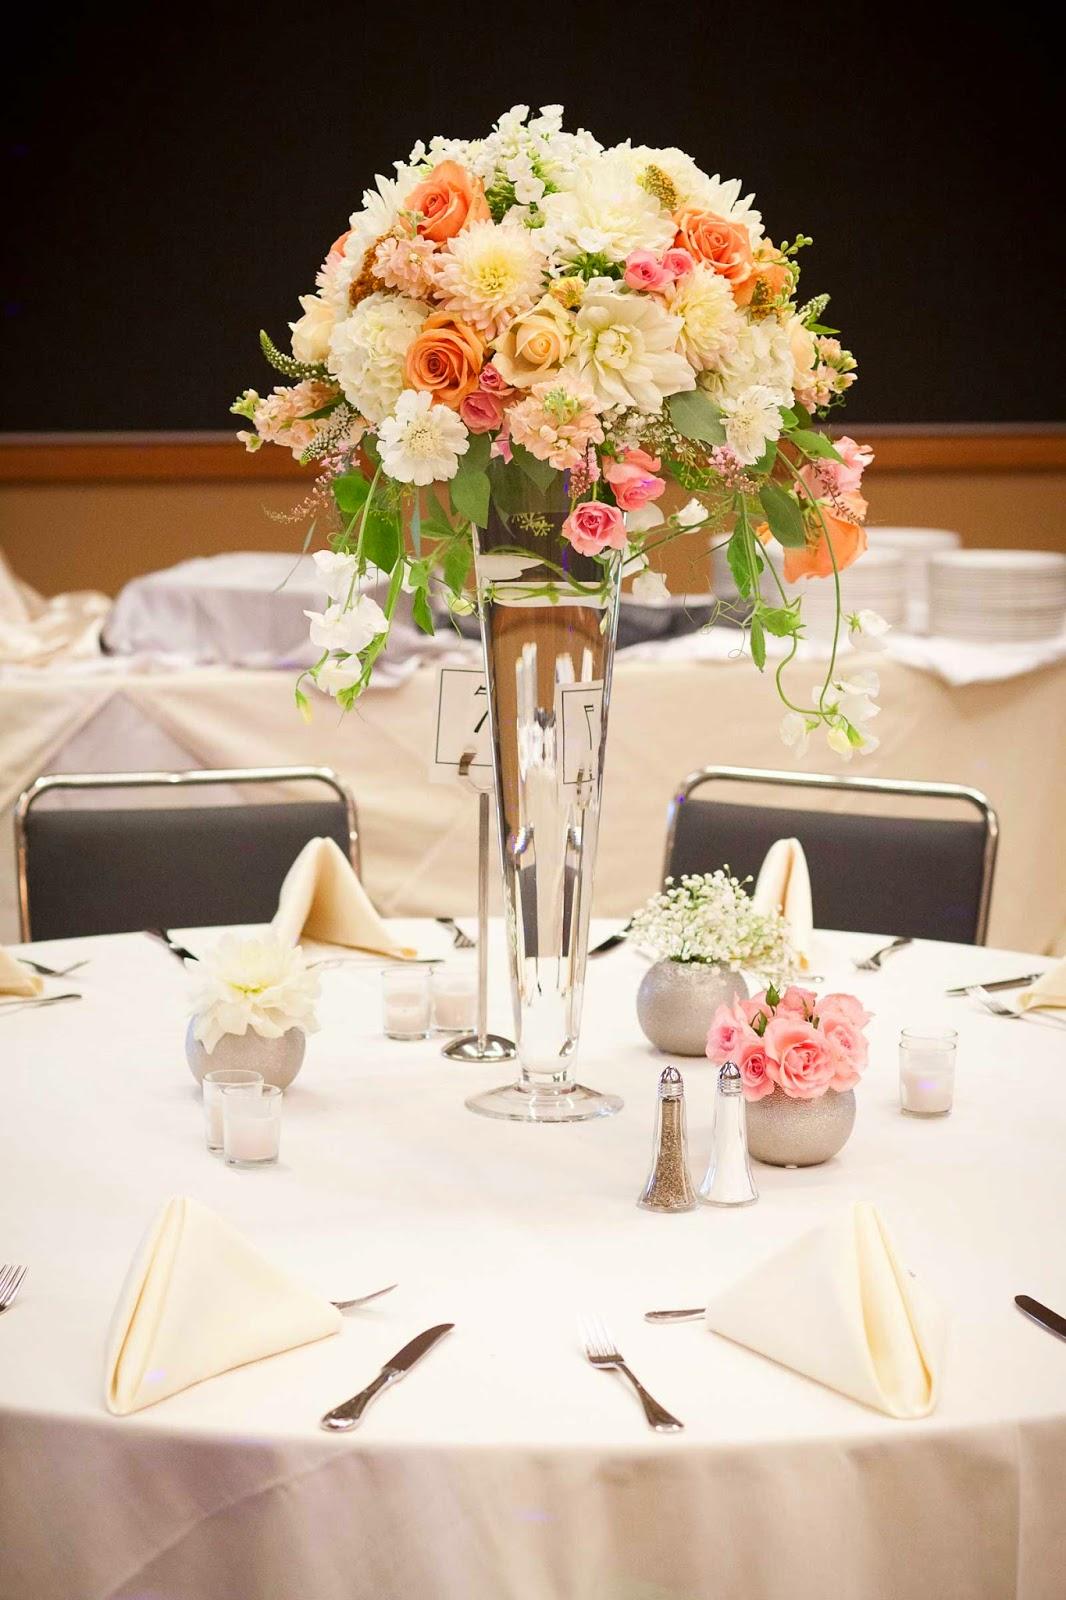 Best Wedding Centerpiece Ideas  Diy Wedding Centerpieces  Tall ...